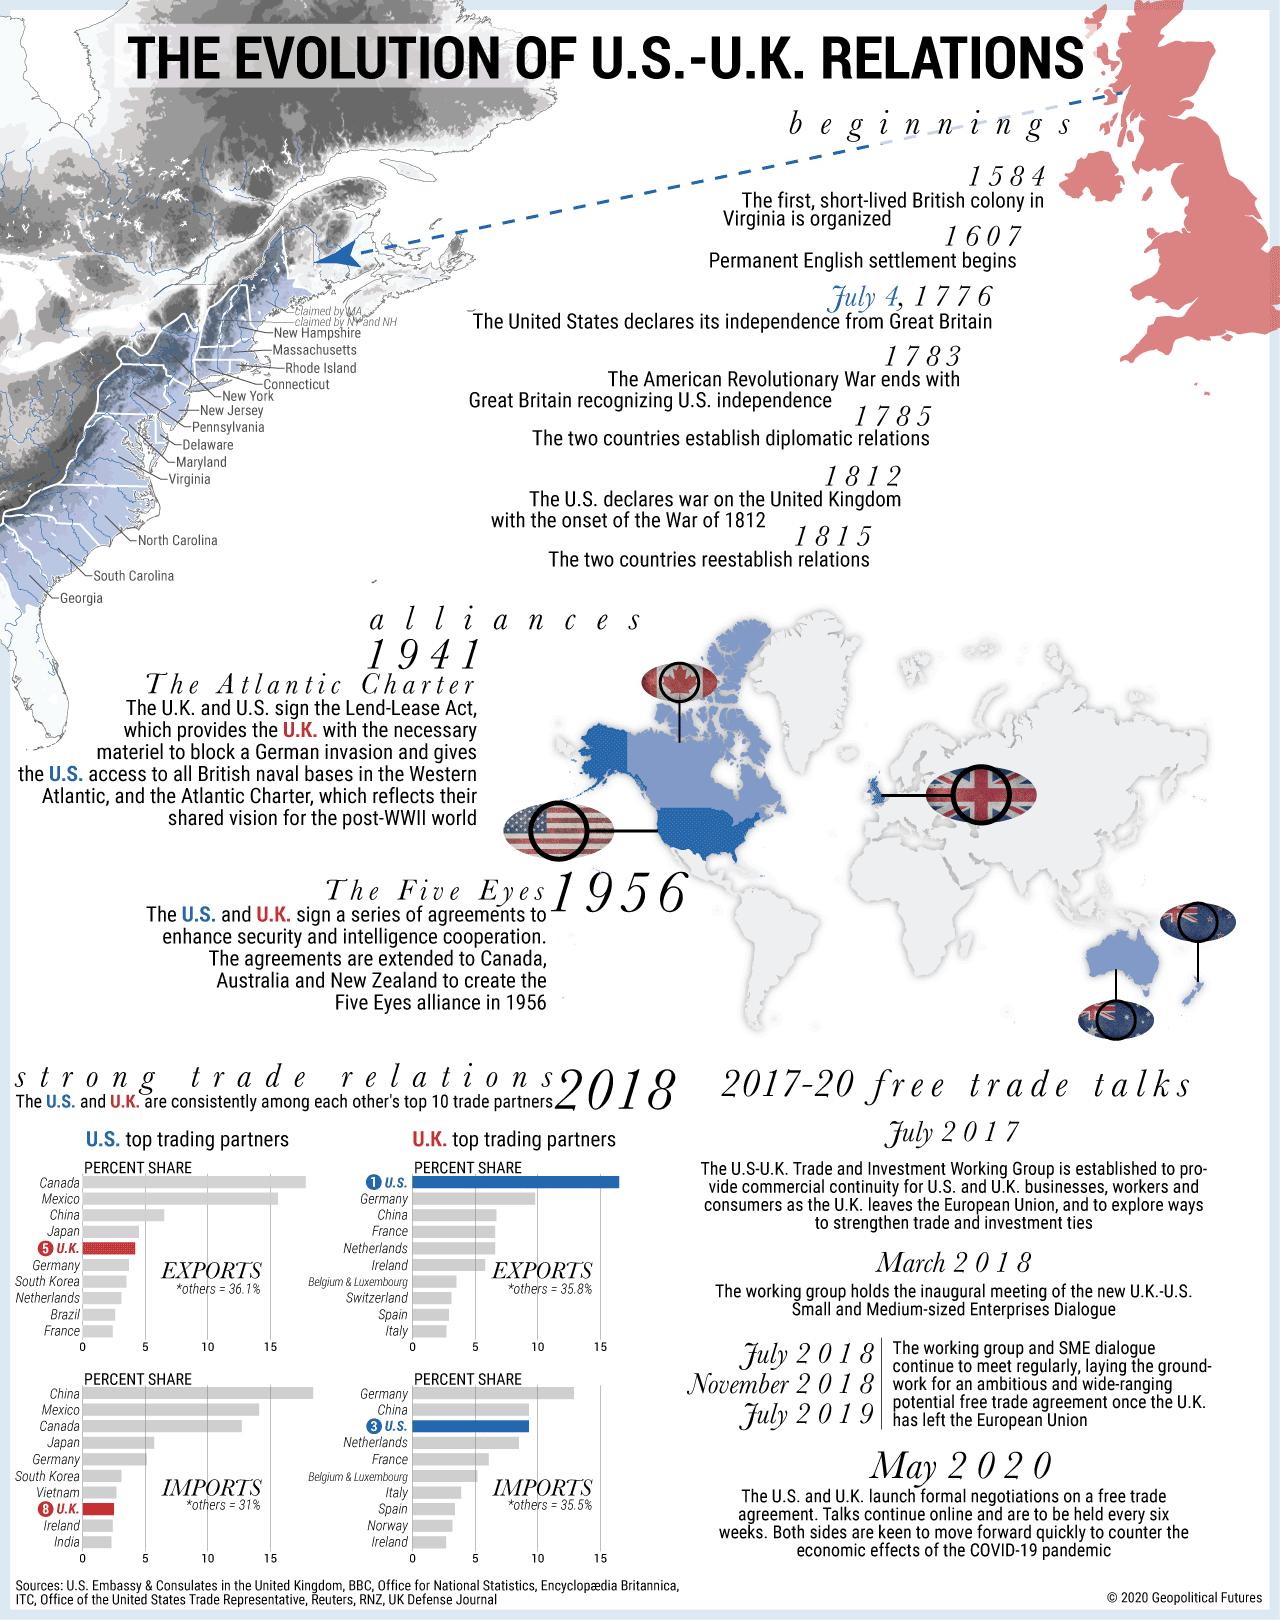 The Evolution of U.S.-U.K. Relations